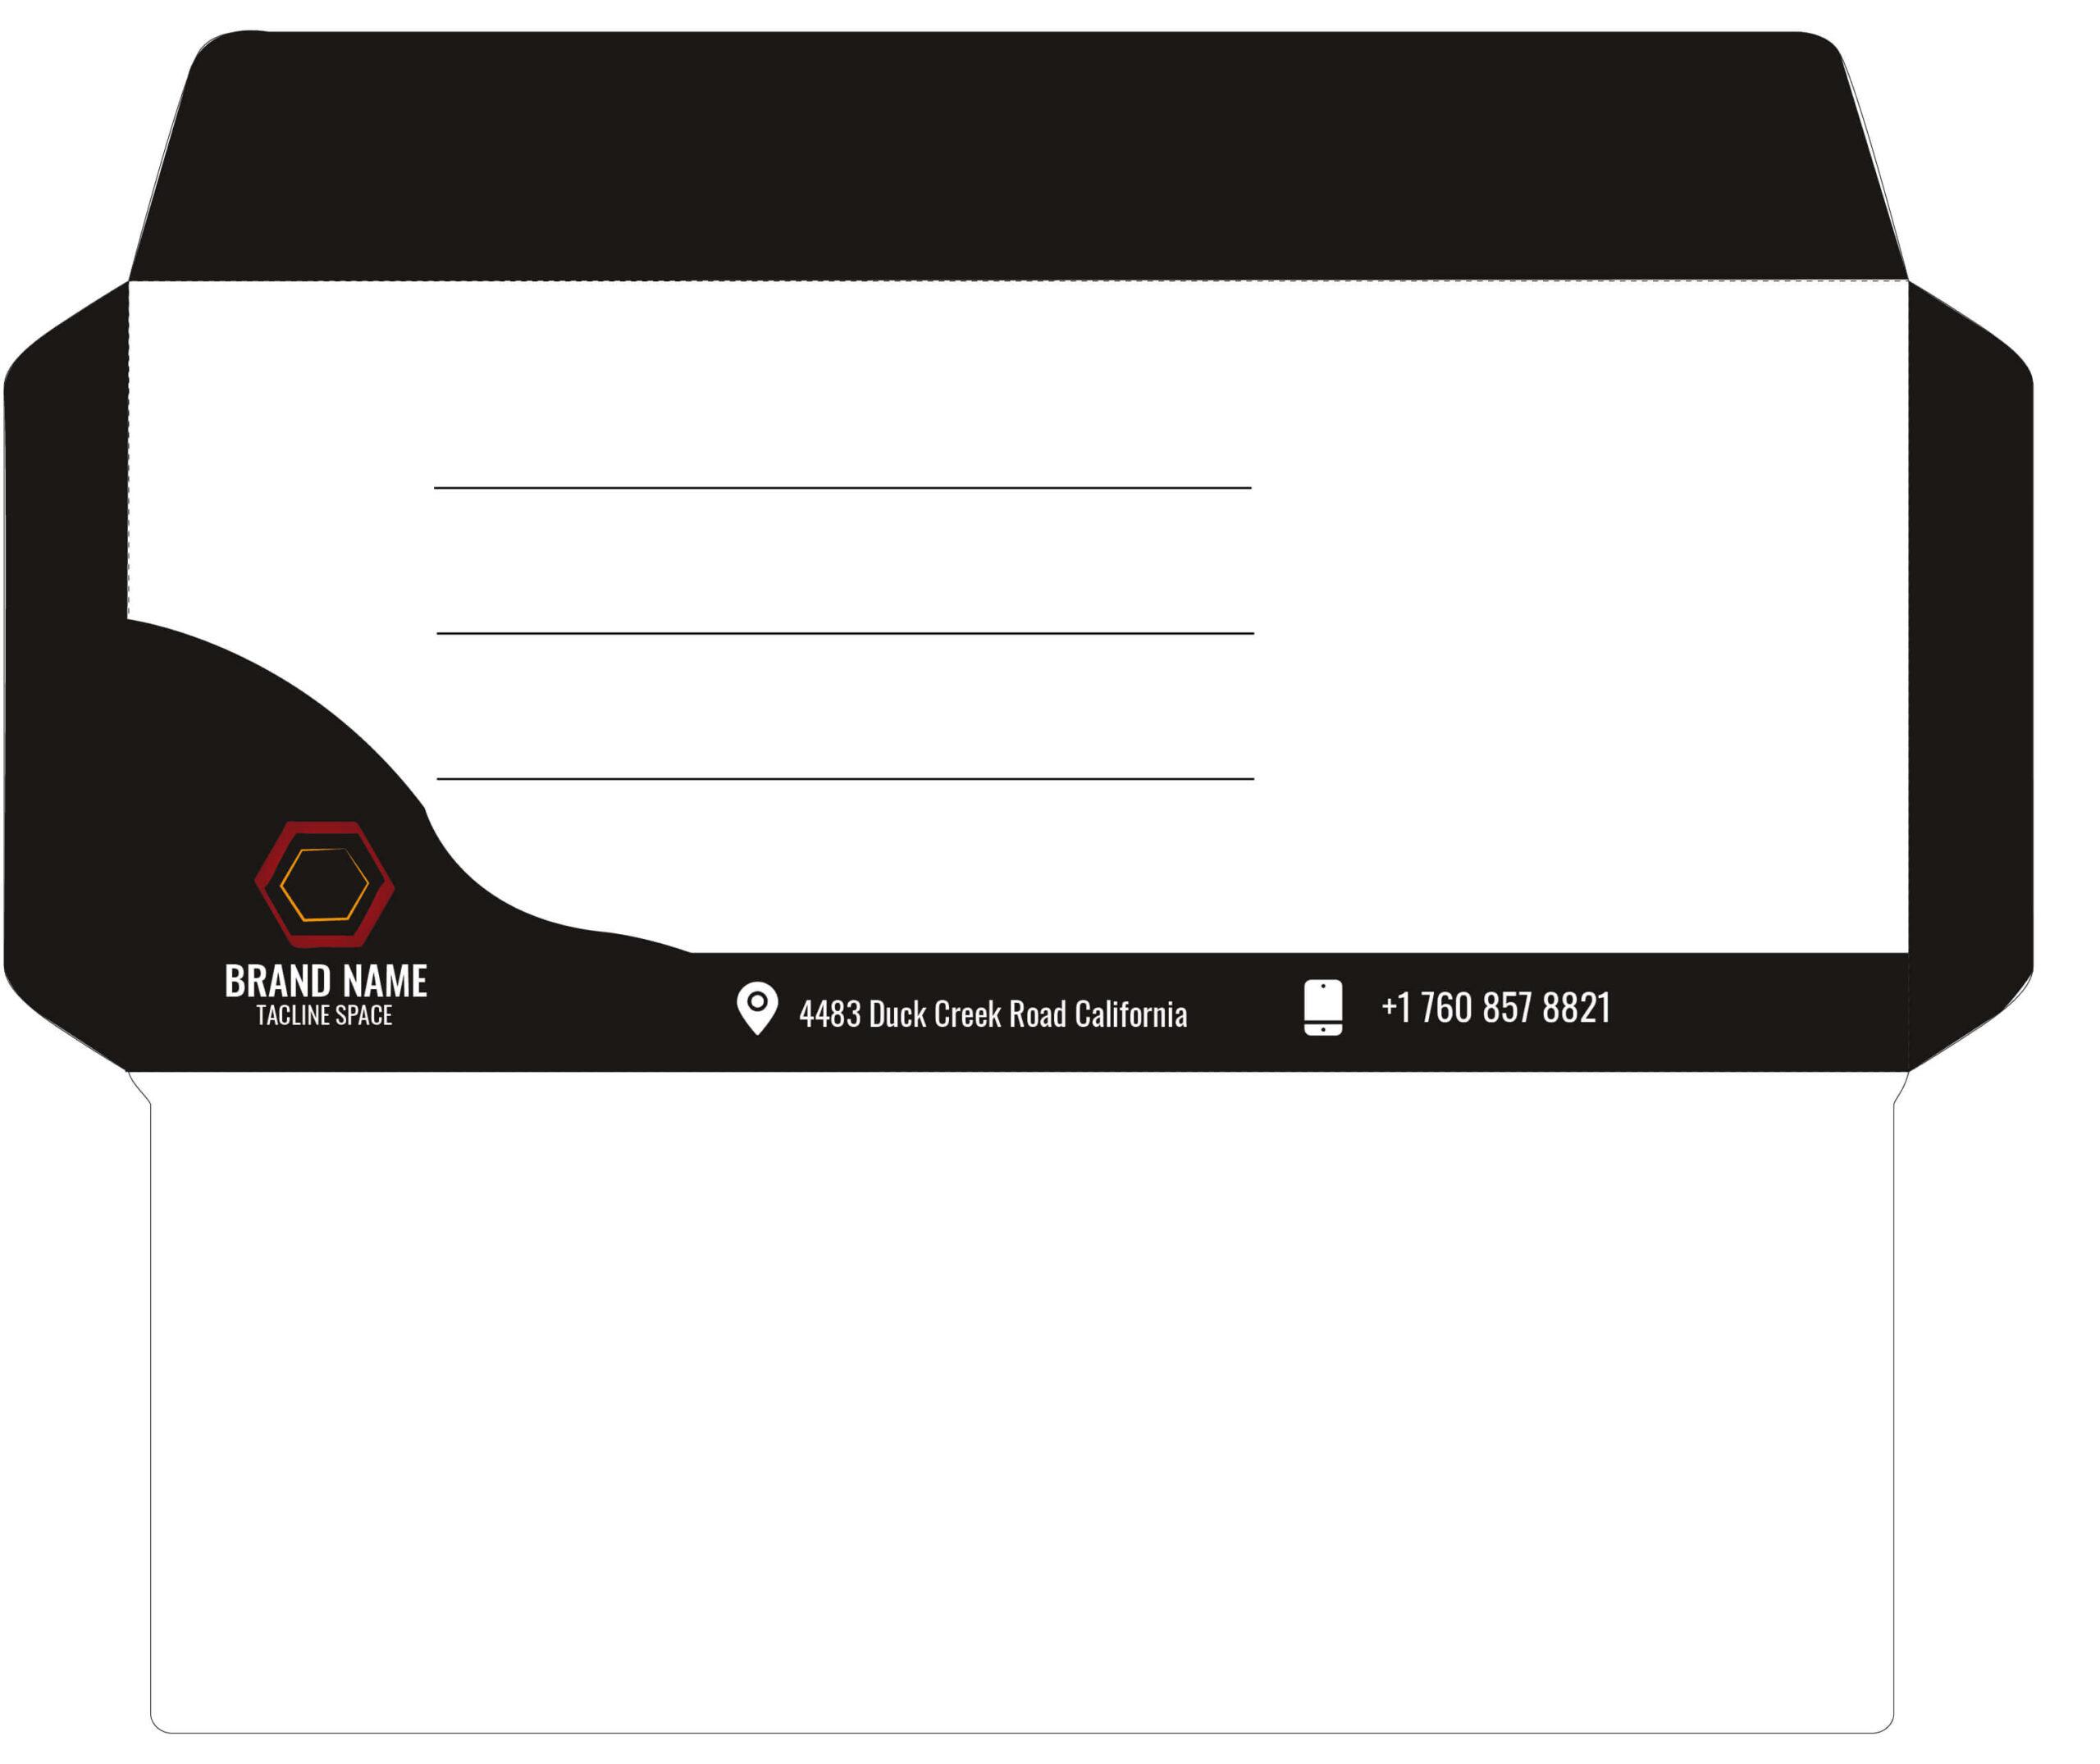 Simple Envelope Design in Adobe Illustrator with Source Files